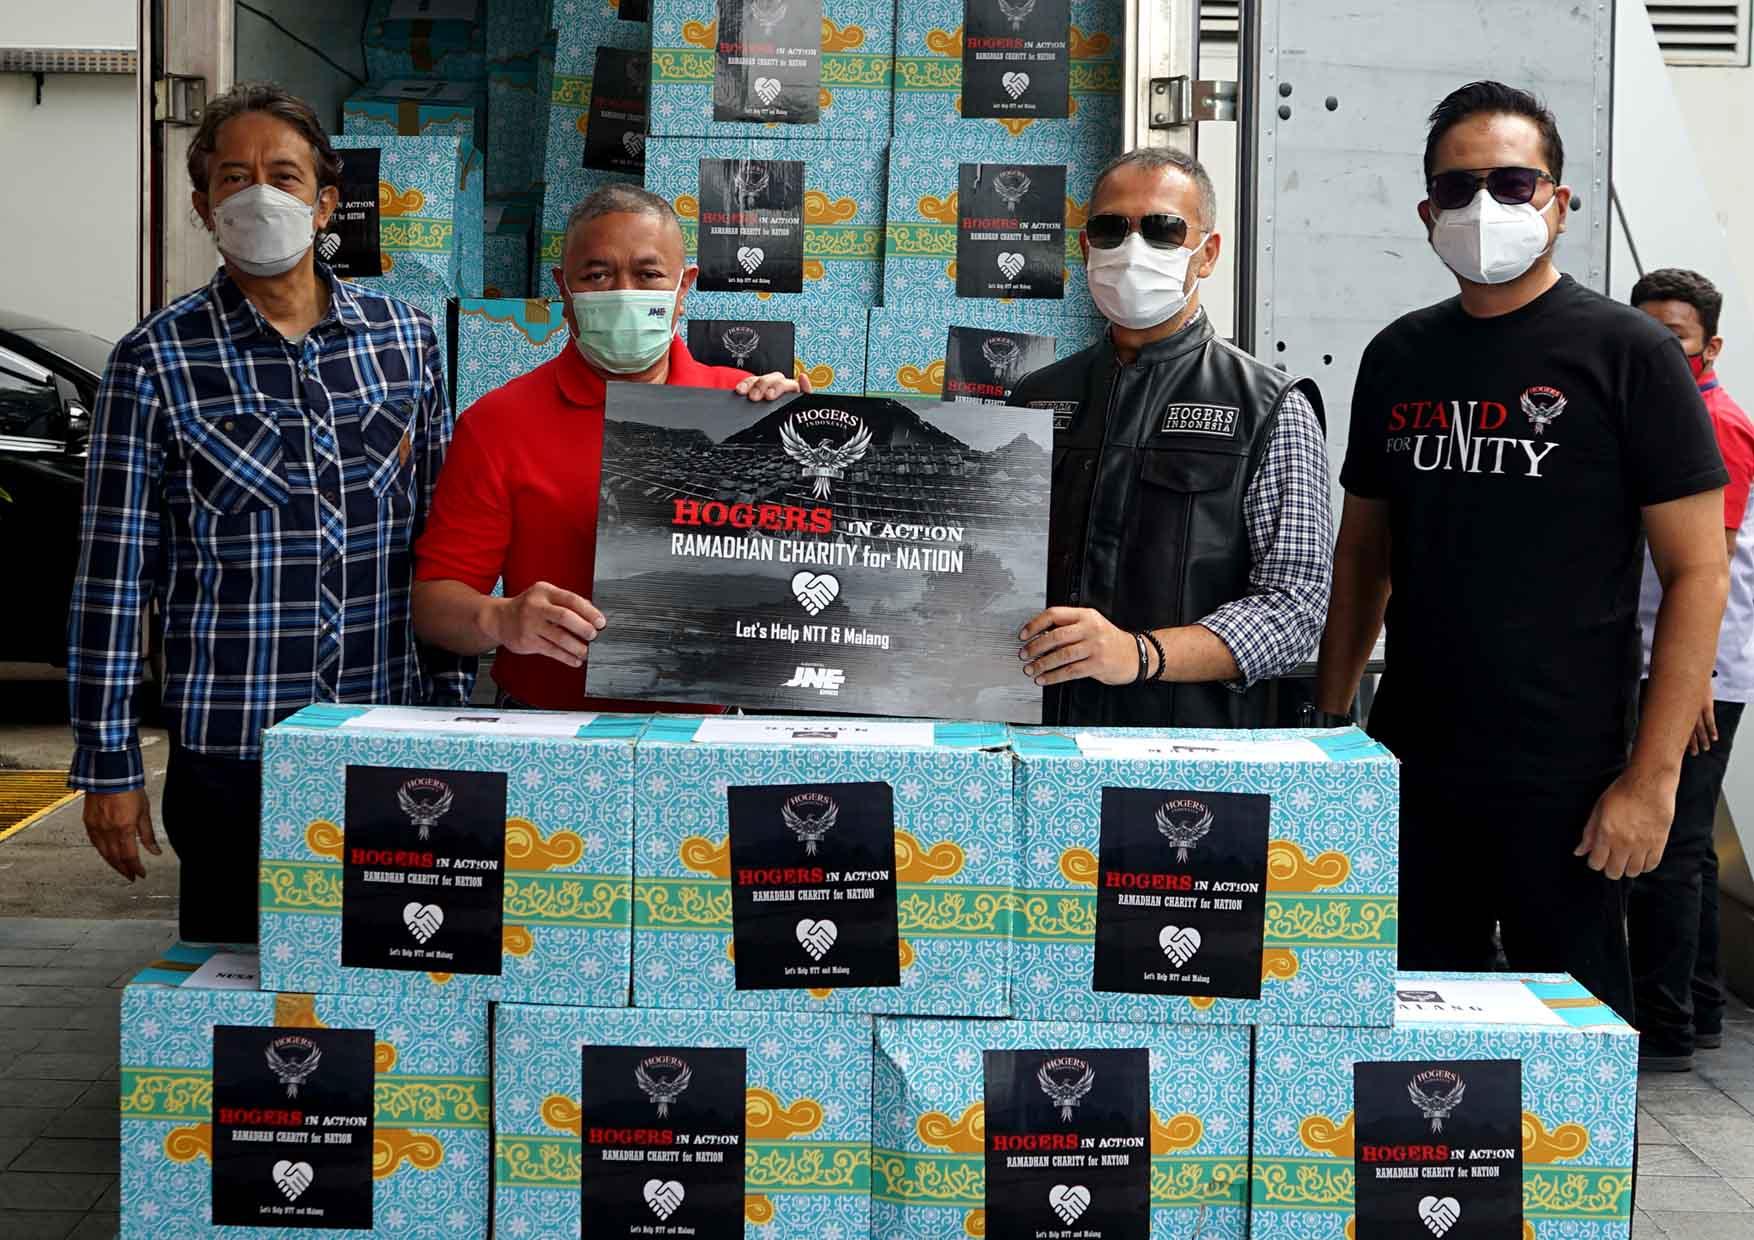 HOGERS Indonesia Kirim Bantuan ke Daerah Terdampak Bencana di NTT dan Malang